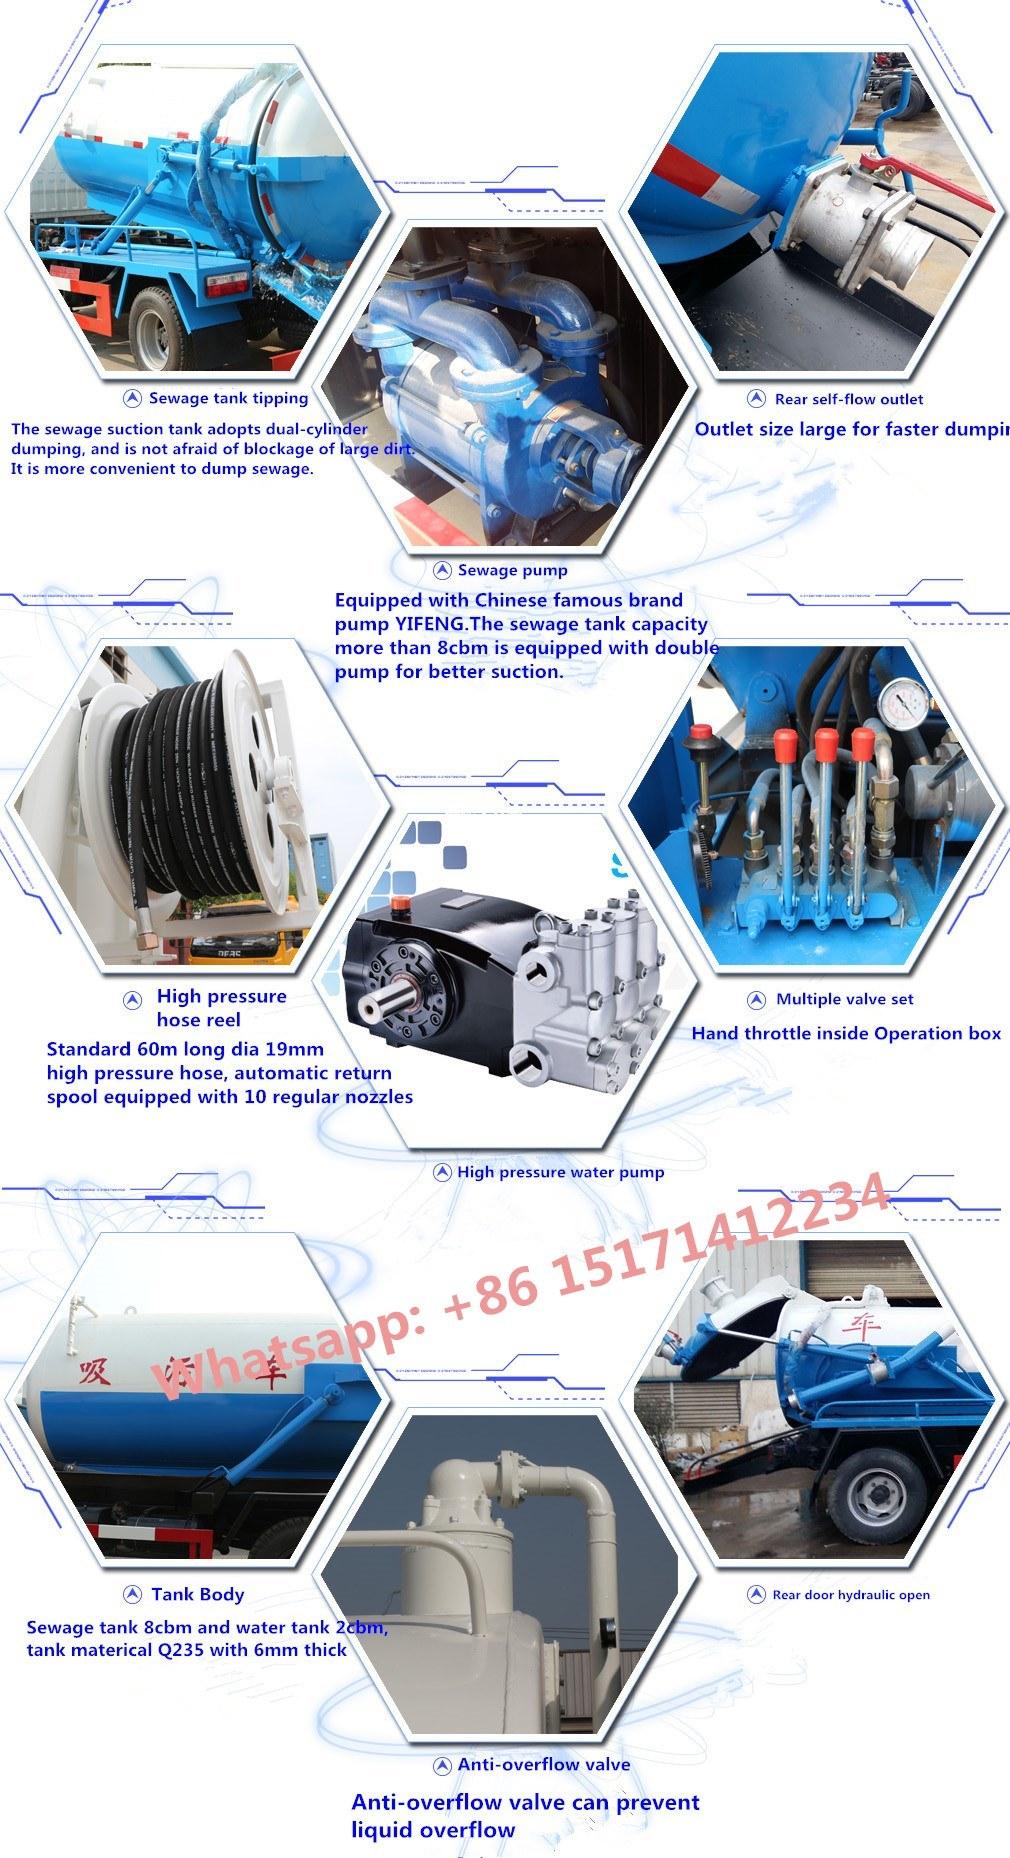 HOWO 4X2 Vacuum Sewage Suction Truck 6000L Sewel Jetting Truck Sewage Drainage Truck for Sale